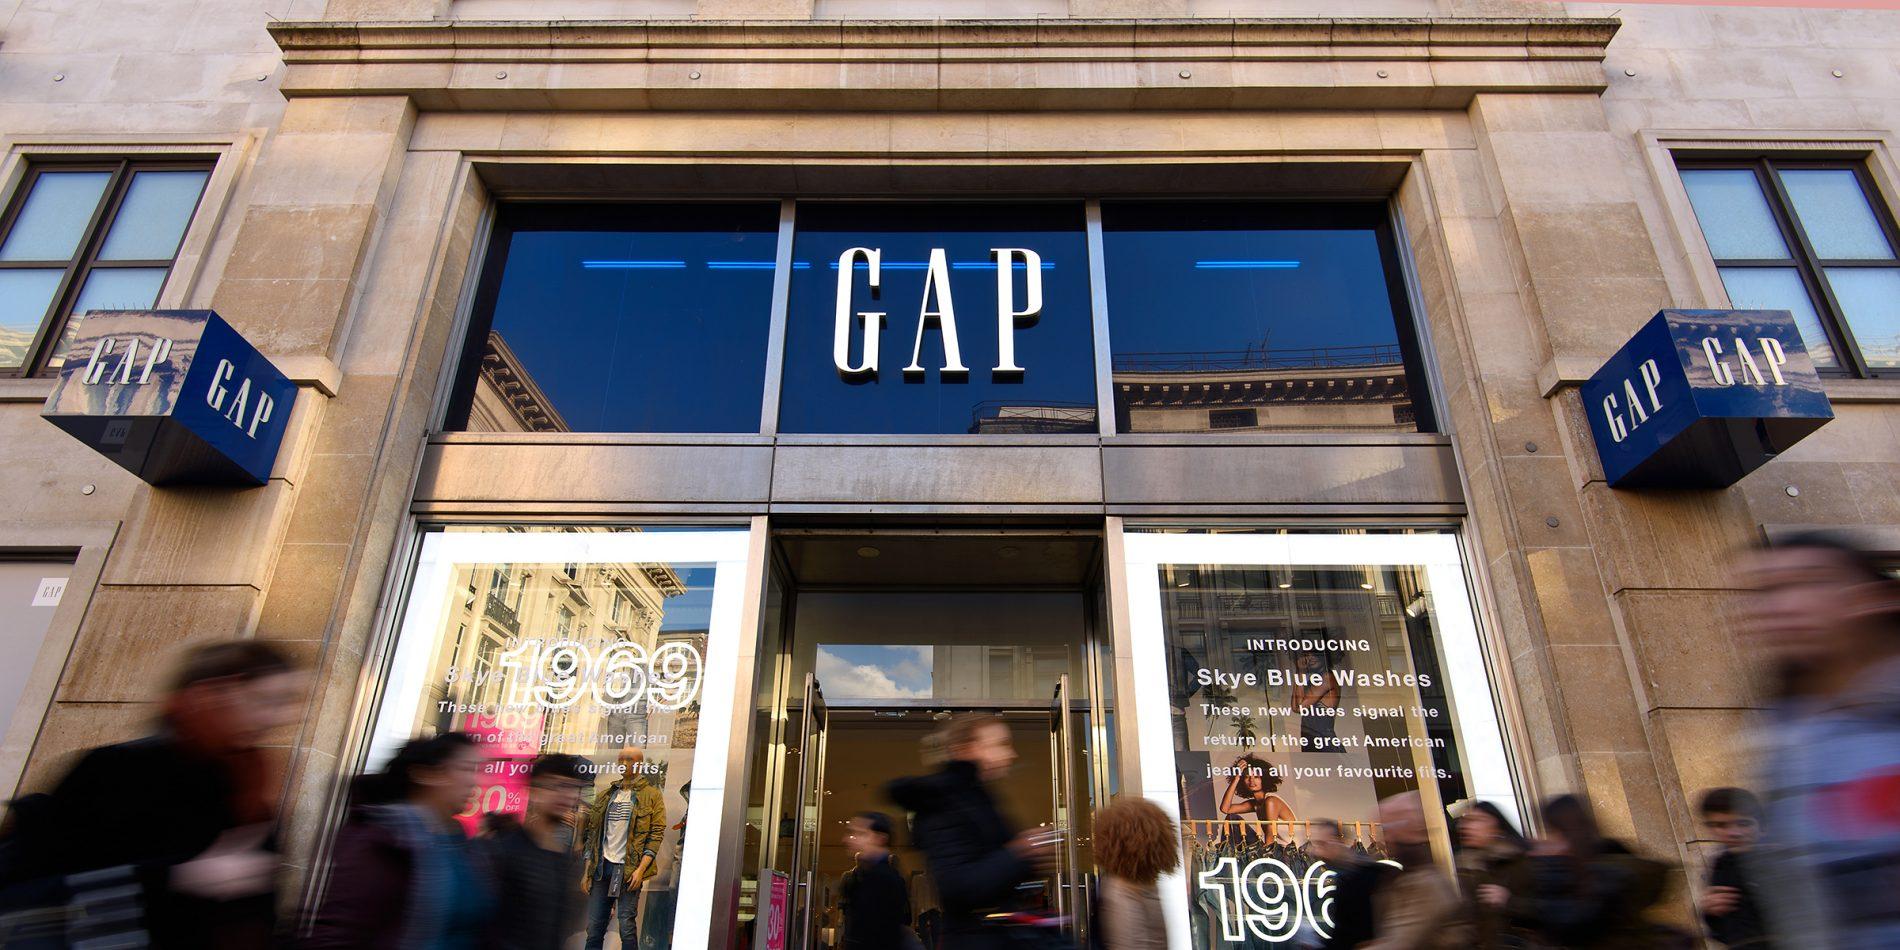 Gap apre al franchising estero per Athleta, Janie and Jack